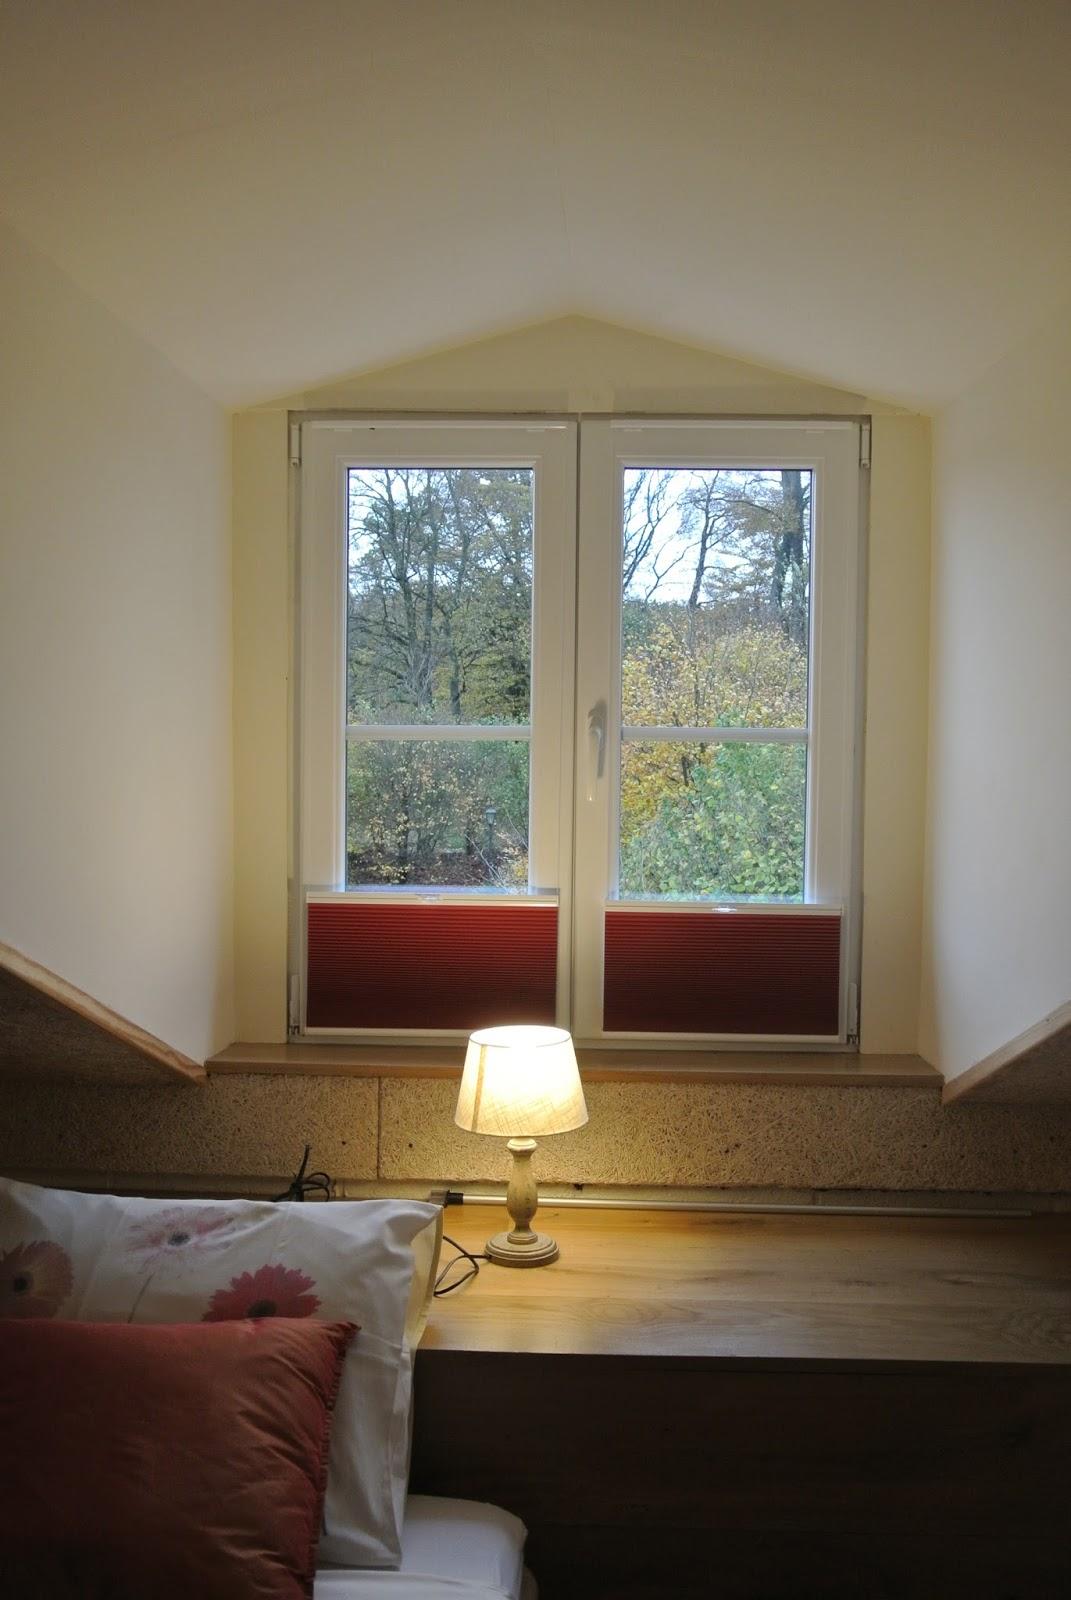 Domaine De L\'Alu: Vakantie-Appartement (A) 2 kamers (55m²) 2-3 personen